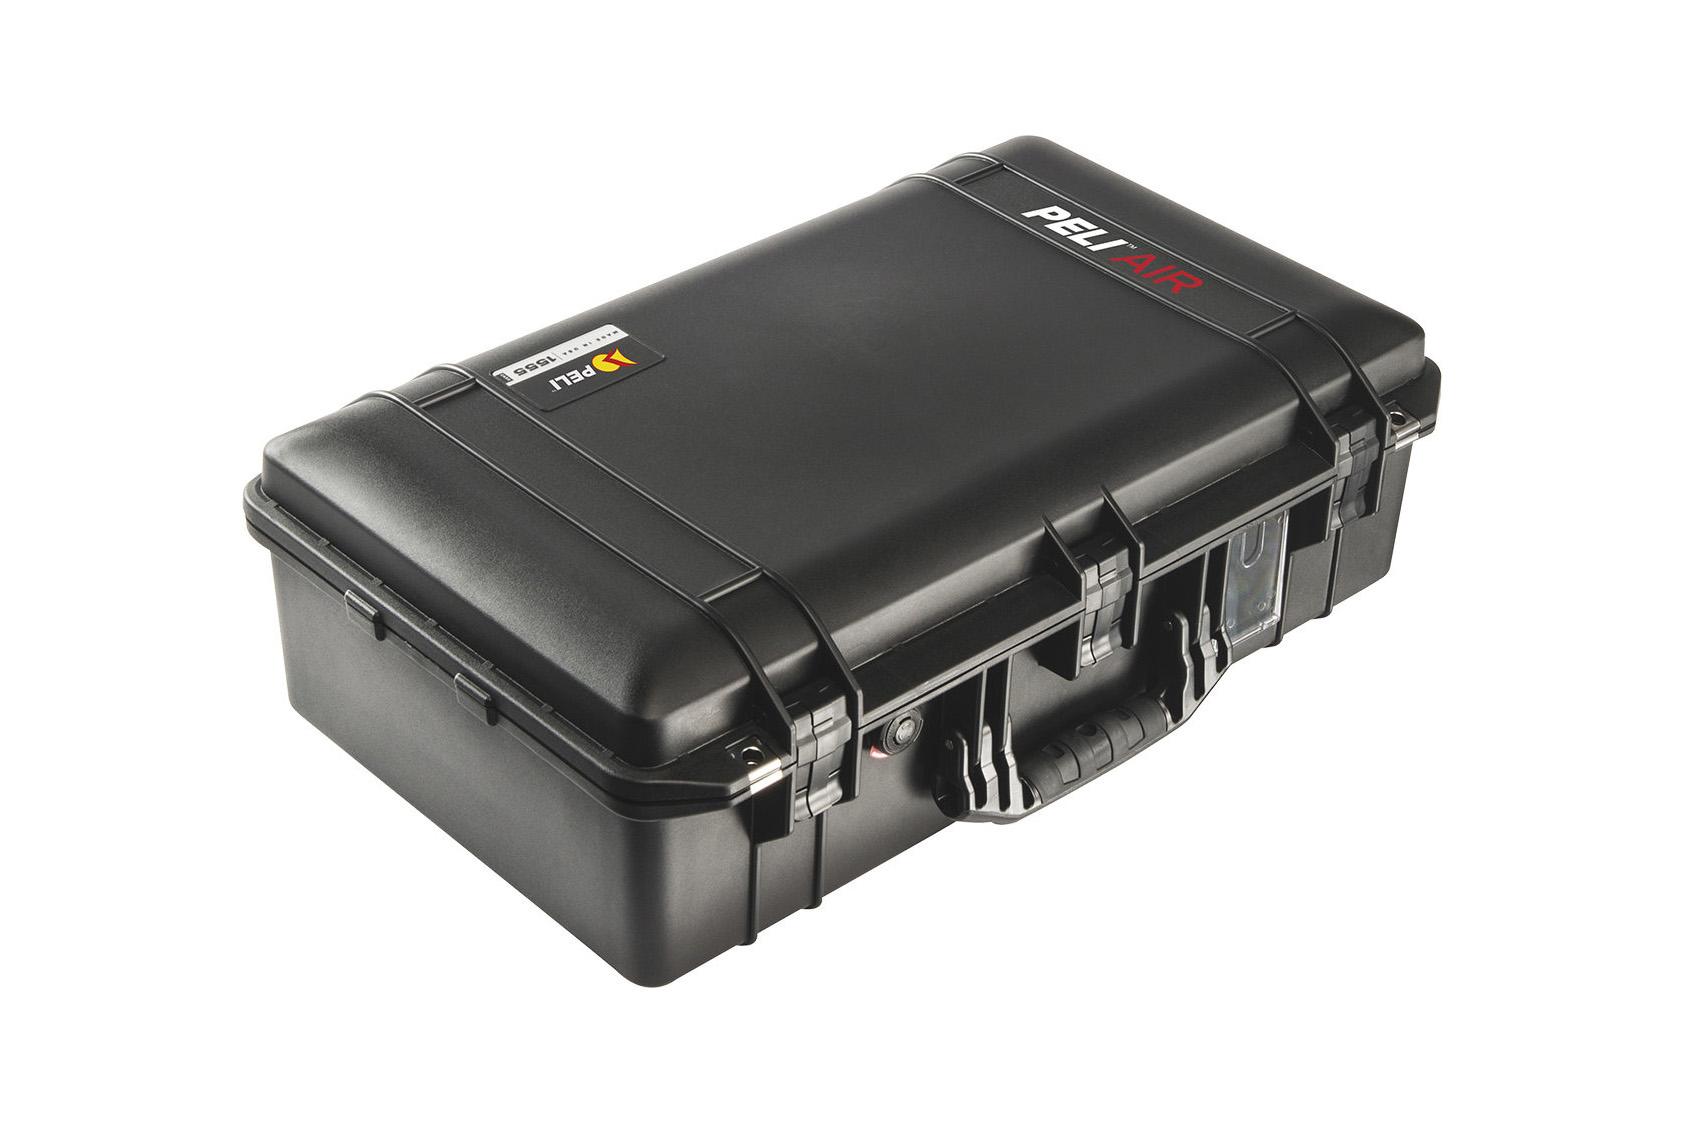 peli-products-air-case-1555-pelicase-l_4583_1200x1200.jpg